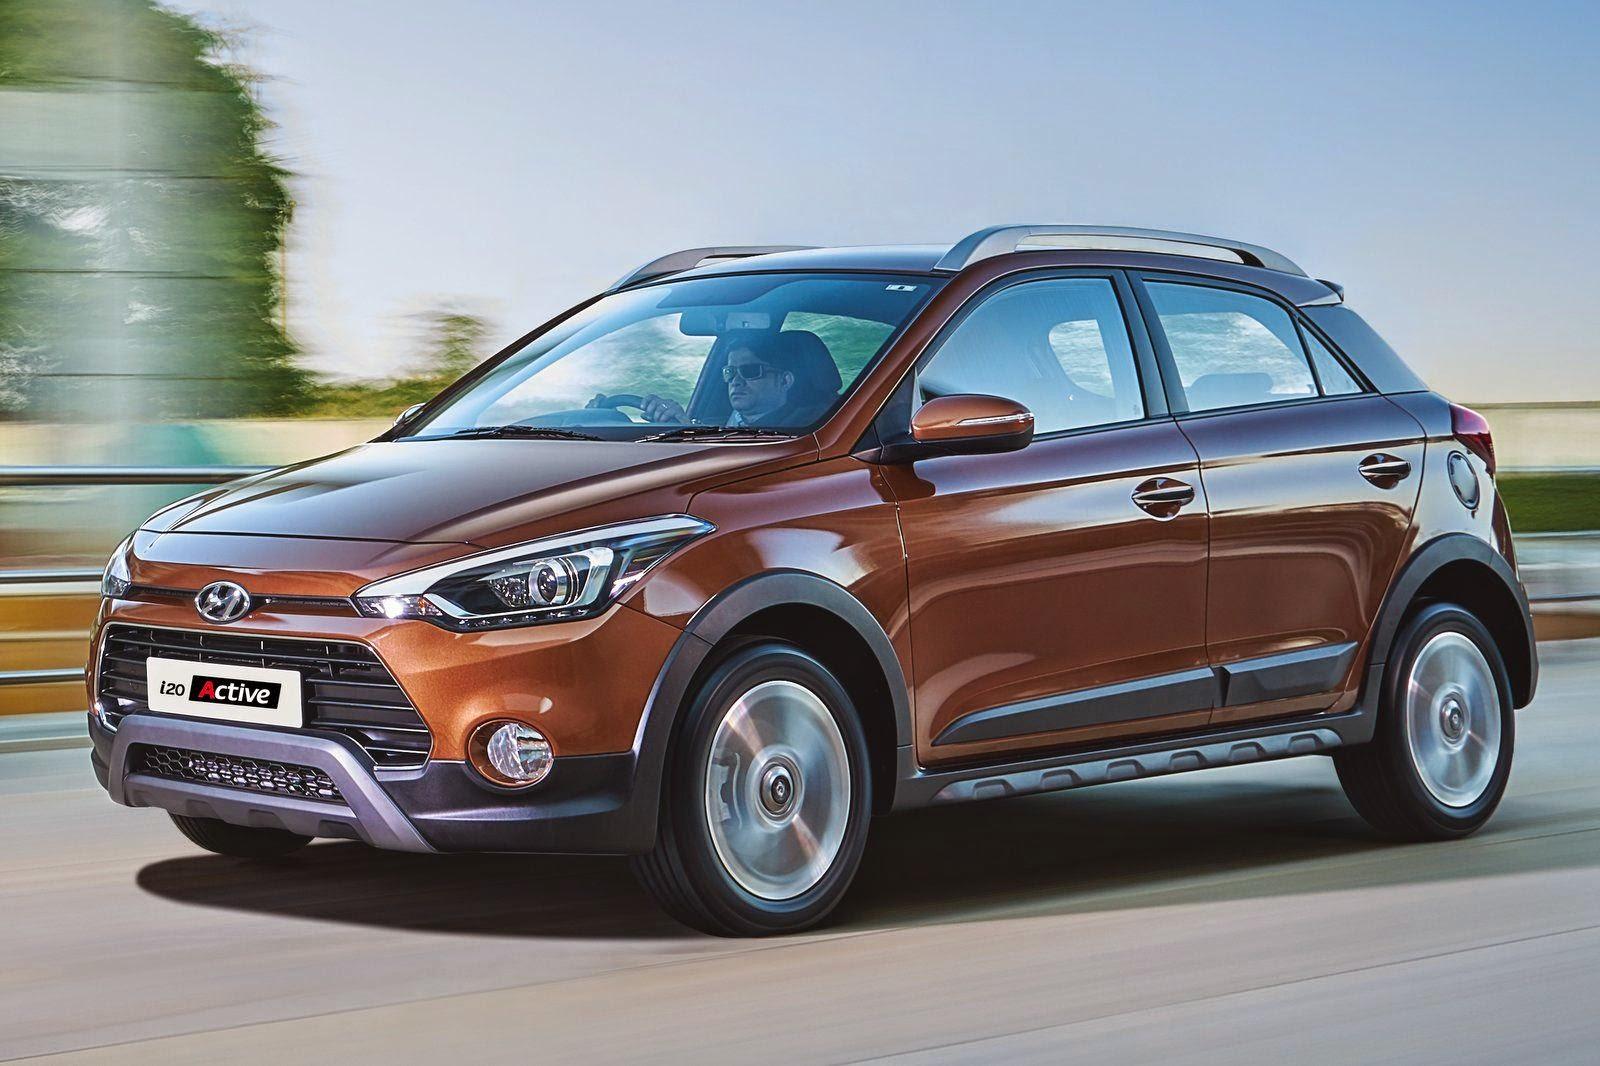 Hyundai%2Bi20%2BActive ஹூண்டாய் கார்களின் விலை உயர்கின்றது